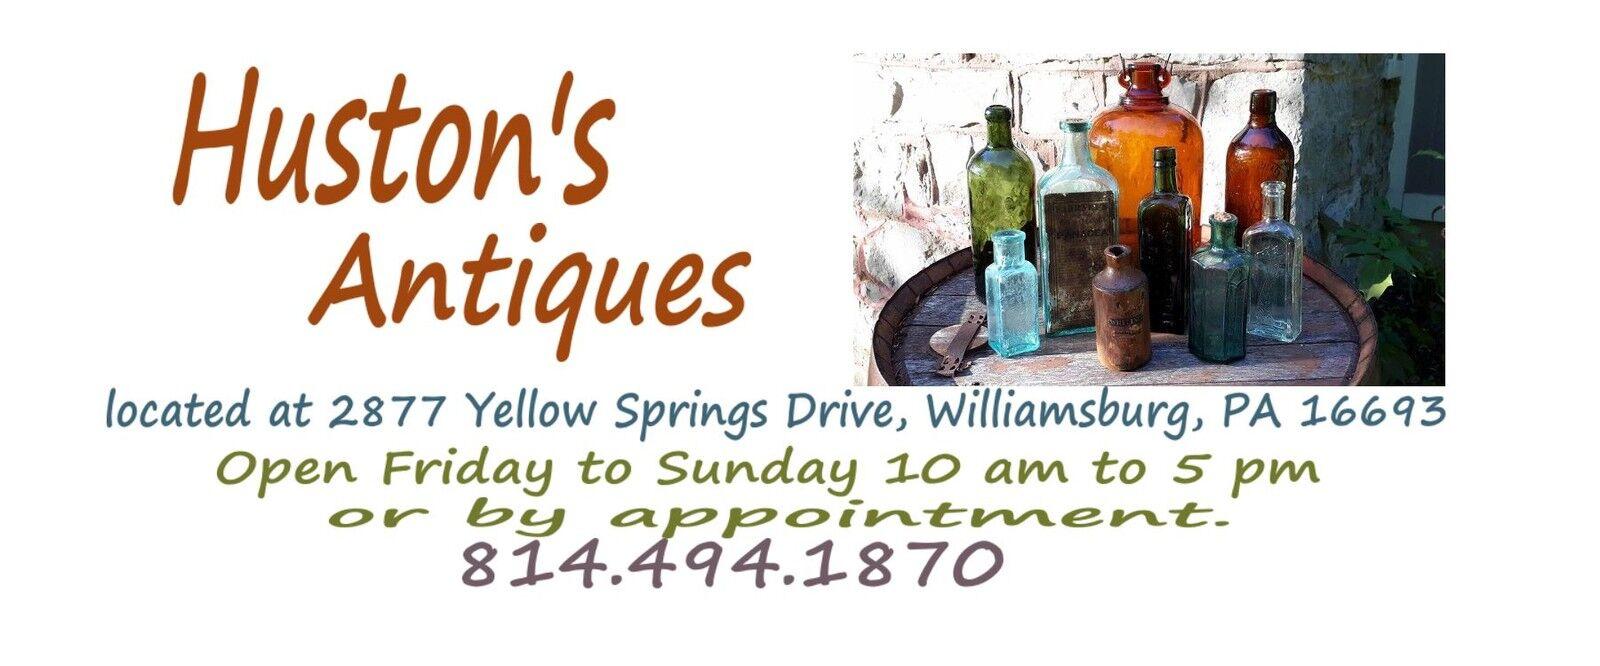 Huston's Antiques